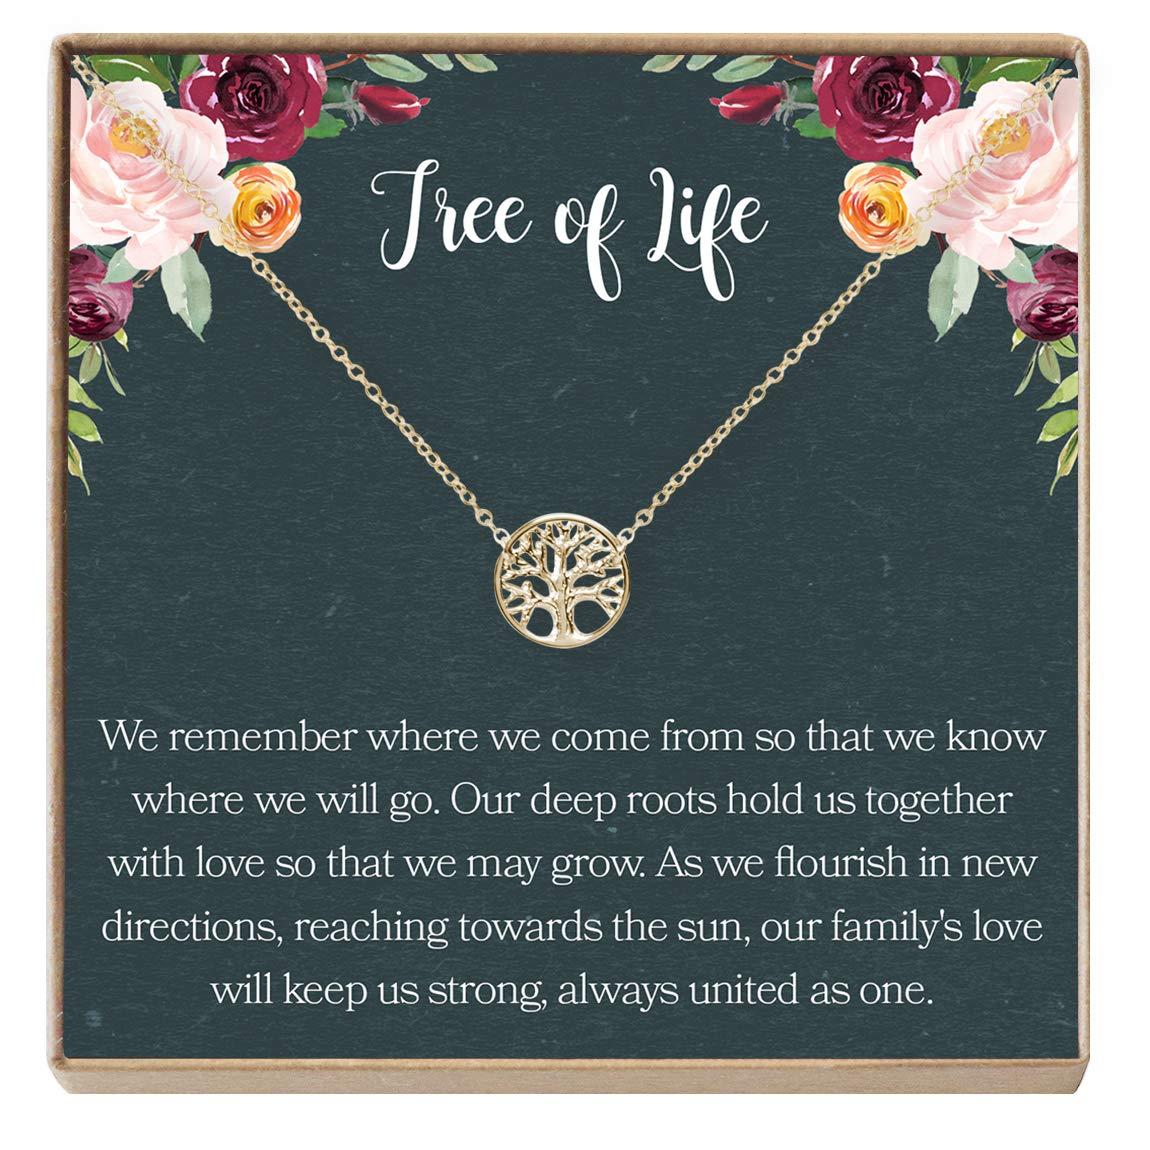 Tree Generations Dear Ava Tree of Life Necklace Gift: Family Tree Necklace Pendant Charm